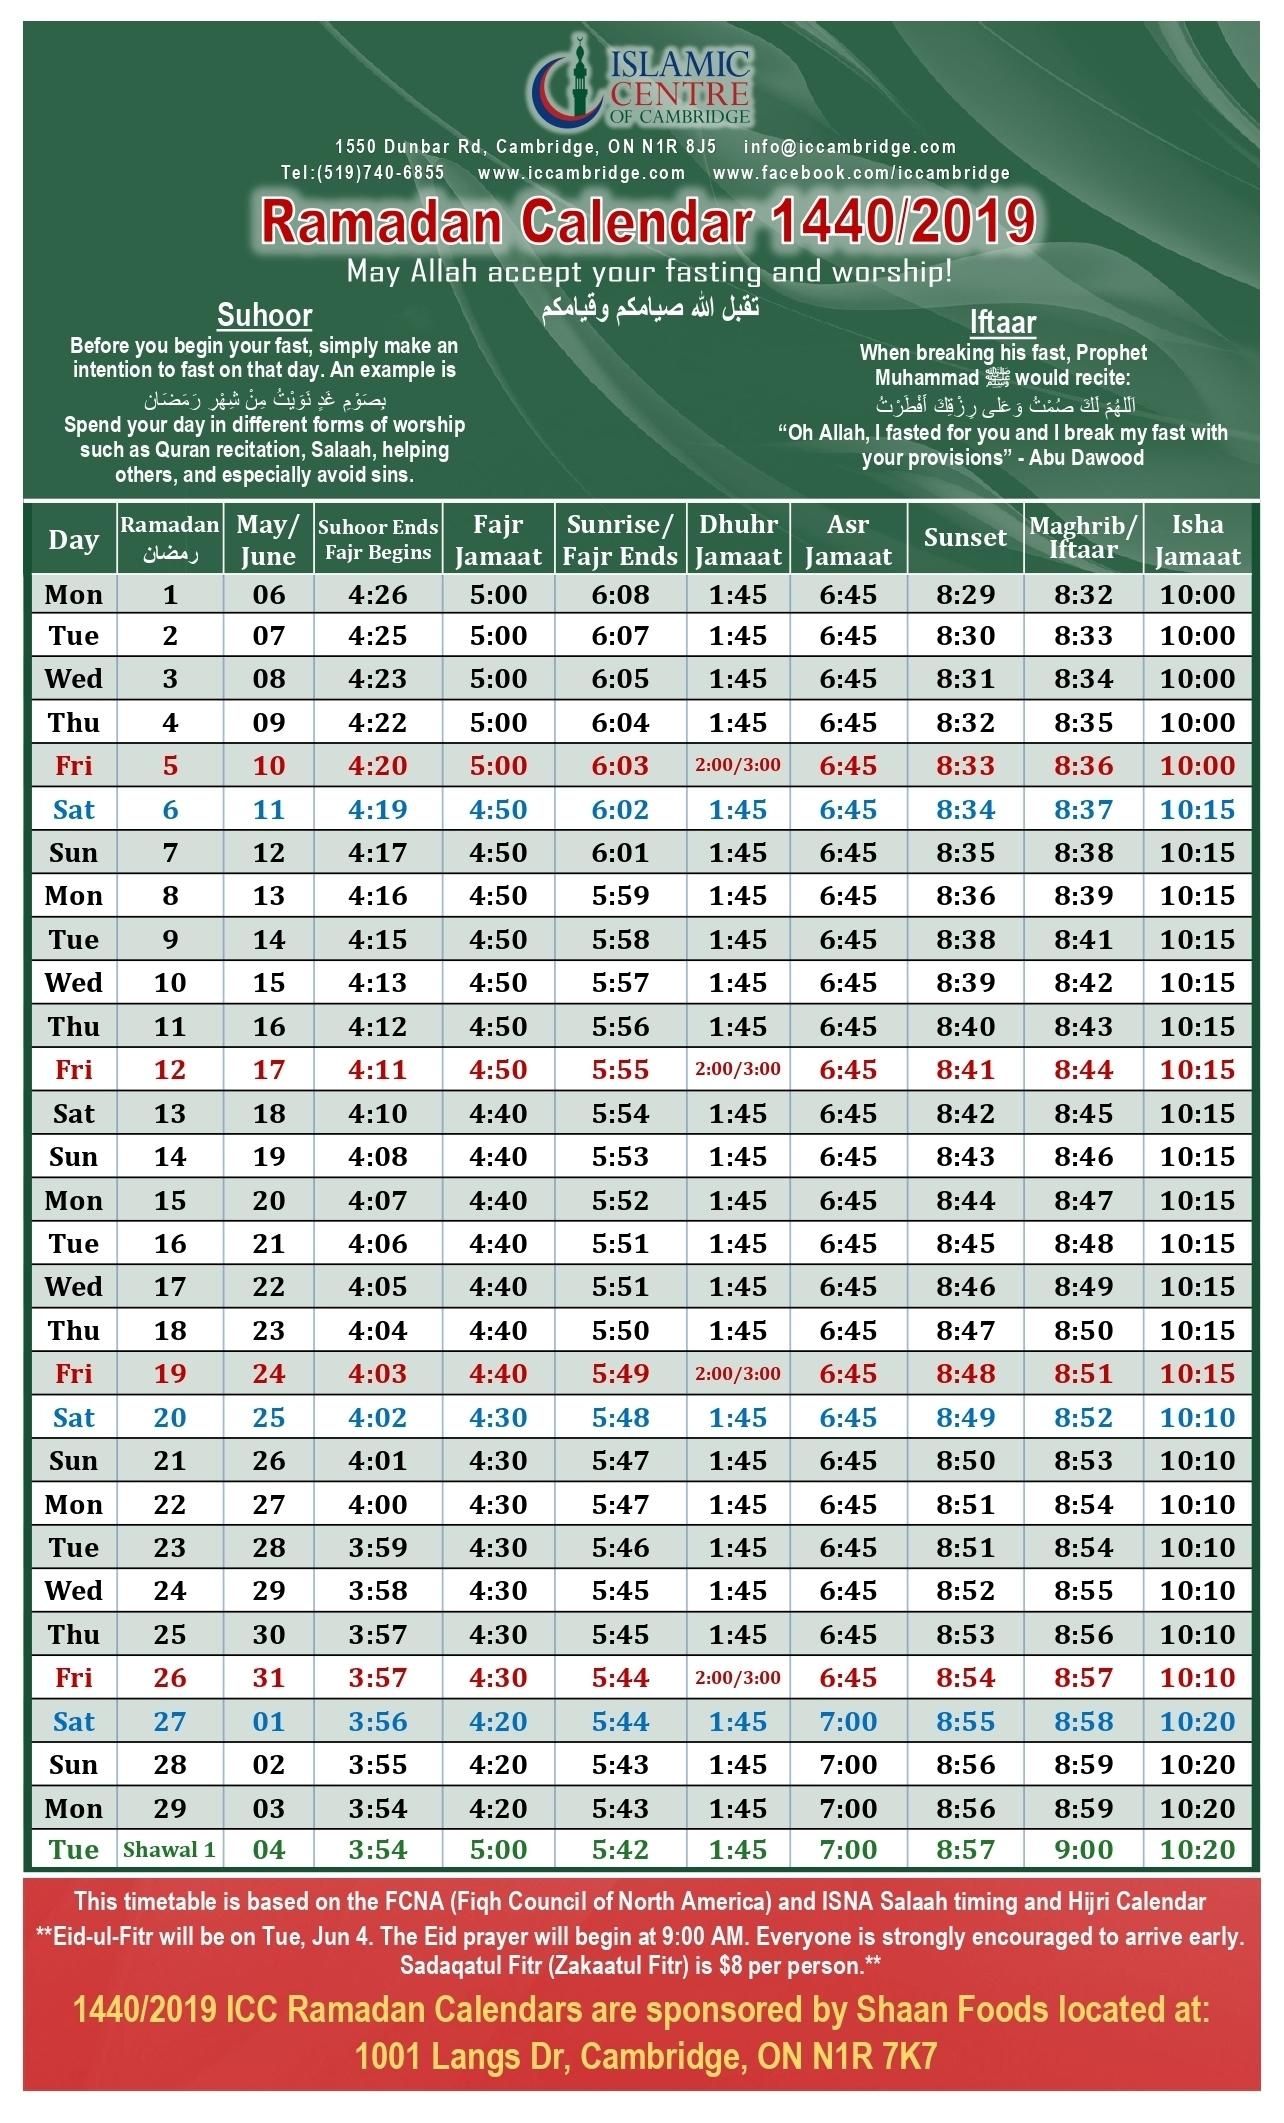 Ramadan Calendar 2019 | Islamic Centre Of Cambridge (Icc) with Urdu Calendar With Time Table